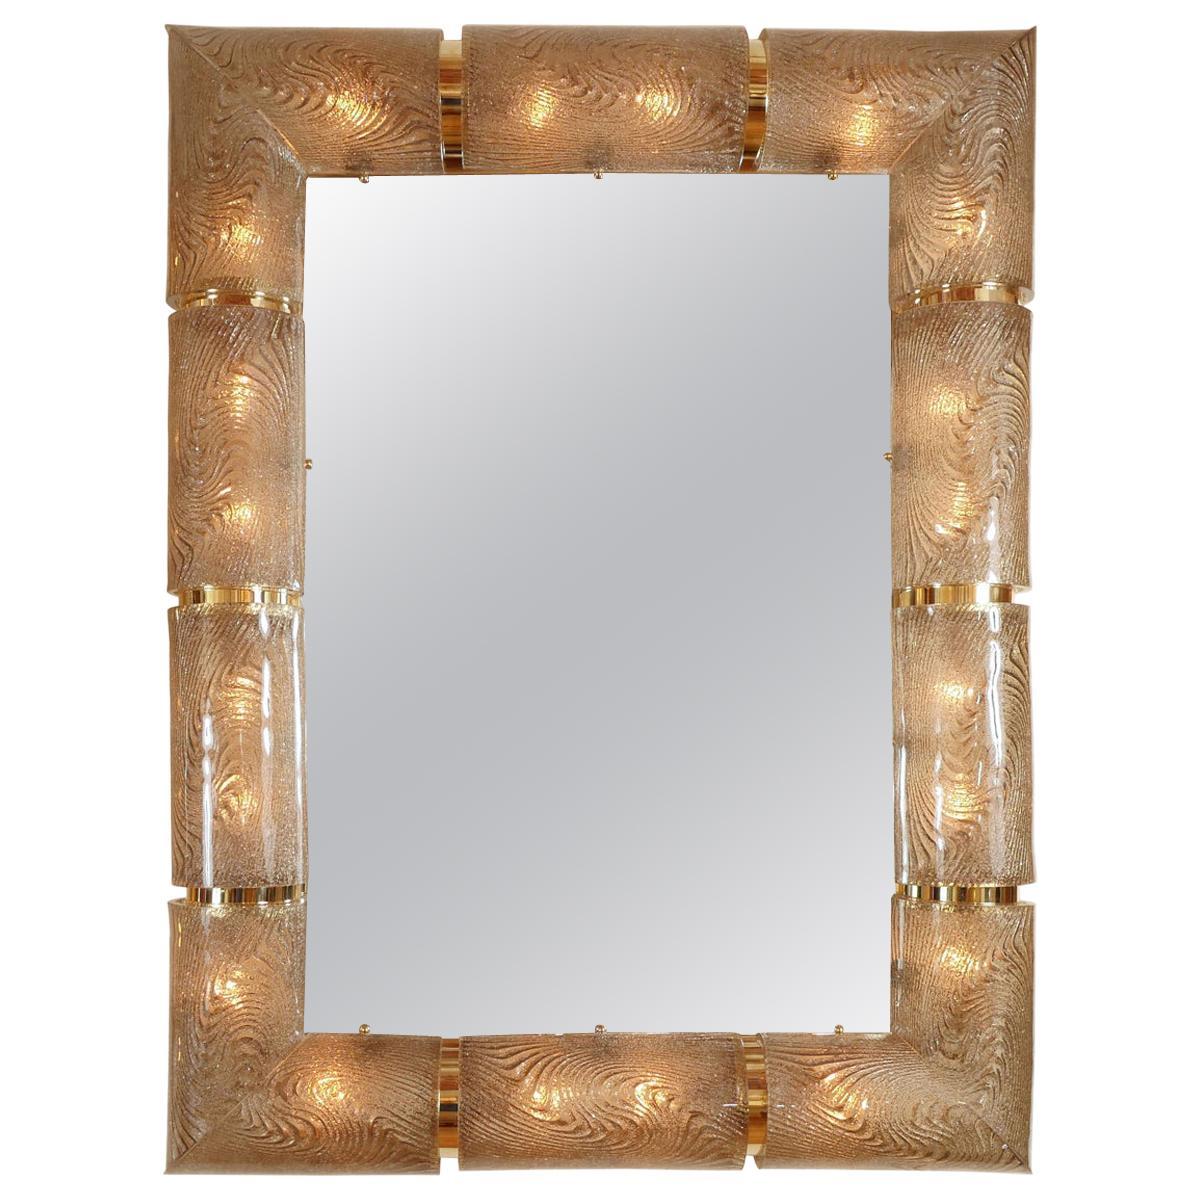 Rectangular Illuminated Mirror with Textured Glass Surround